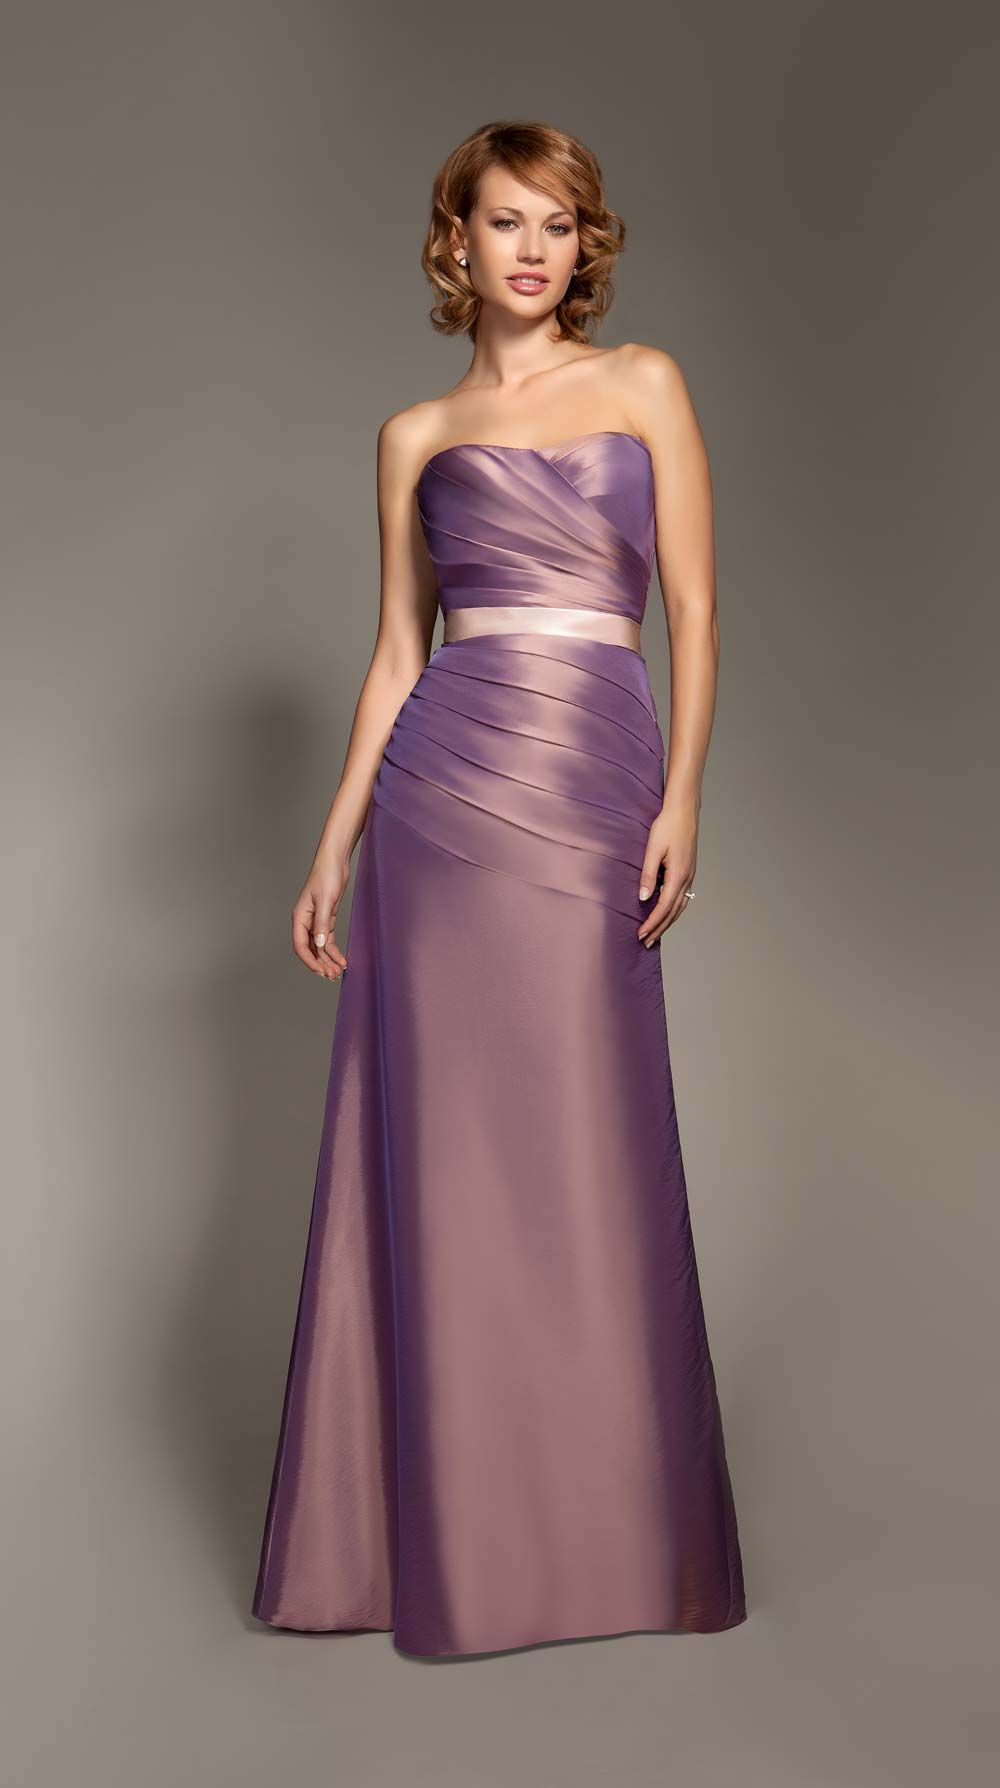 Perfectly purple bridesmaid dresses fabulous styles wedding